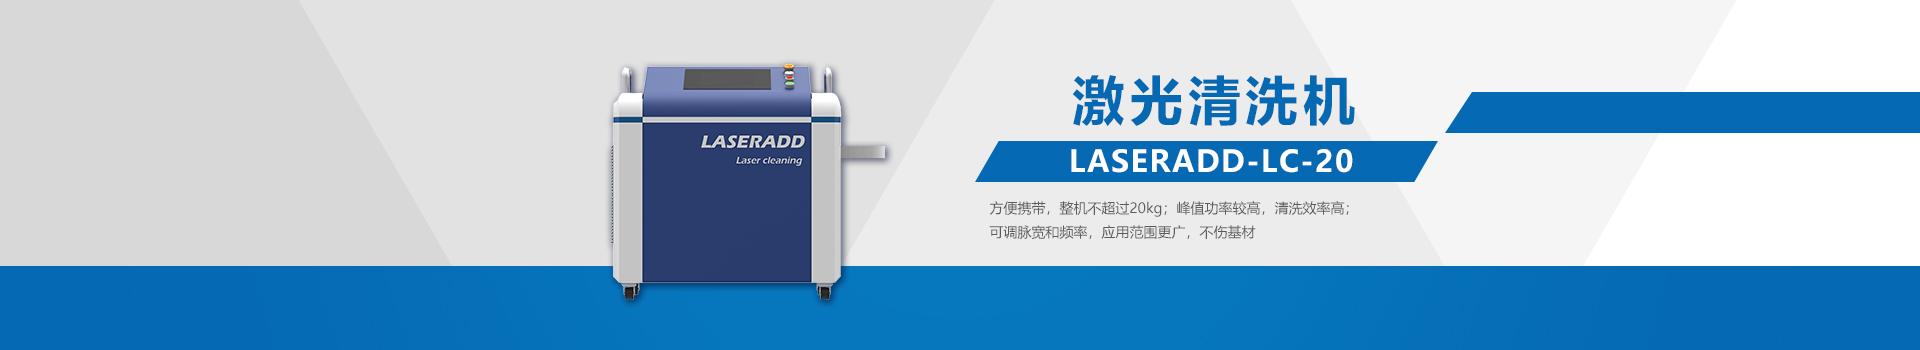 LASERADD-LC-20 激光清洗机